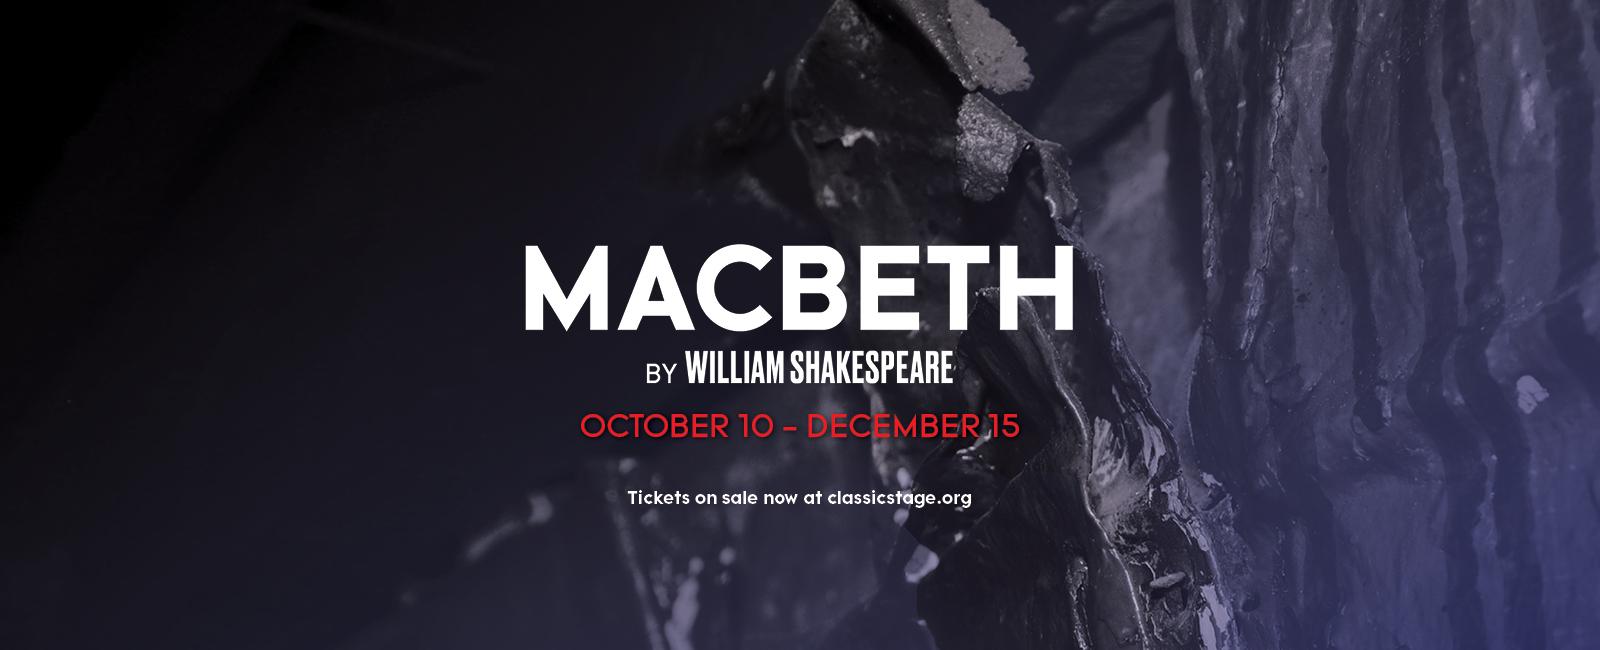 Macbeth Announcement_1600X650.jpg